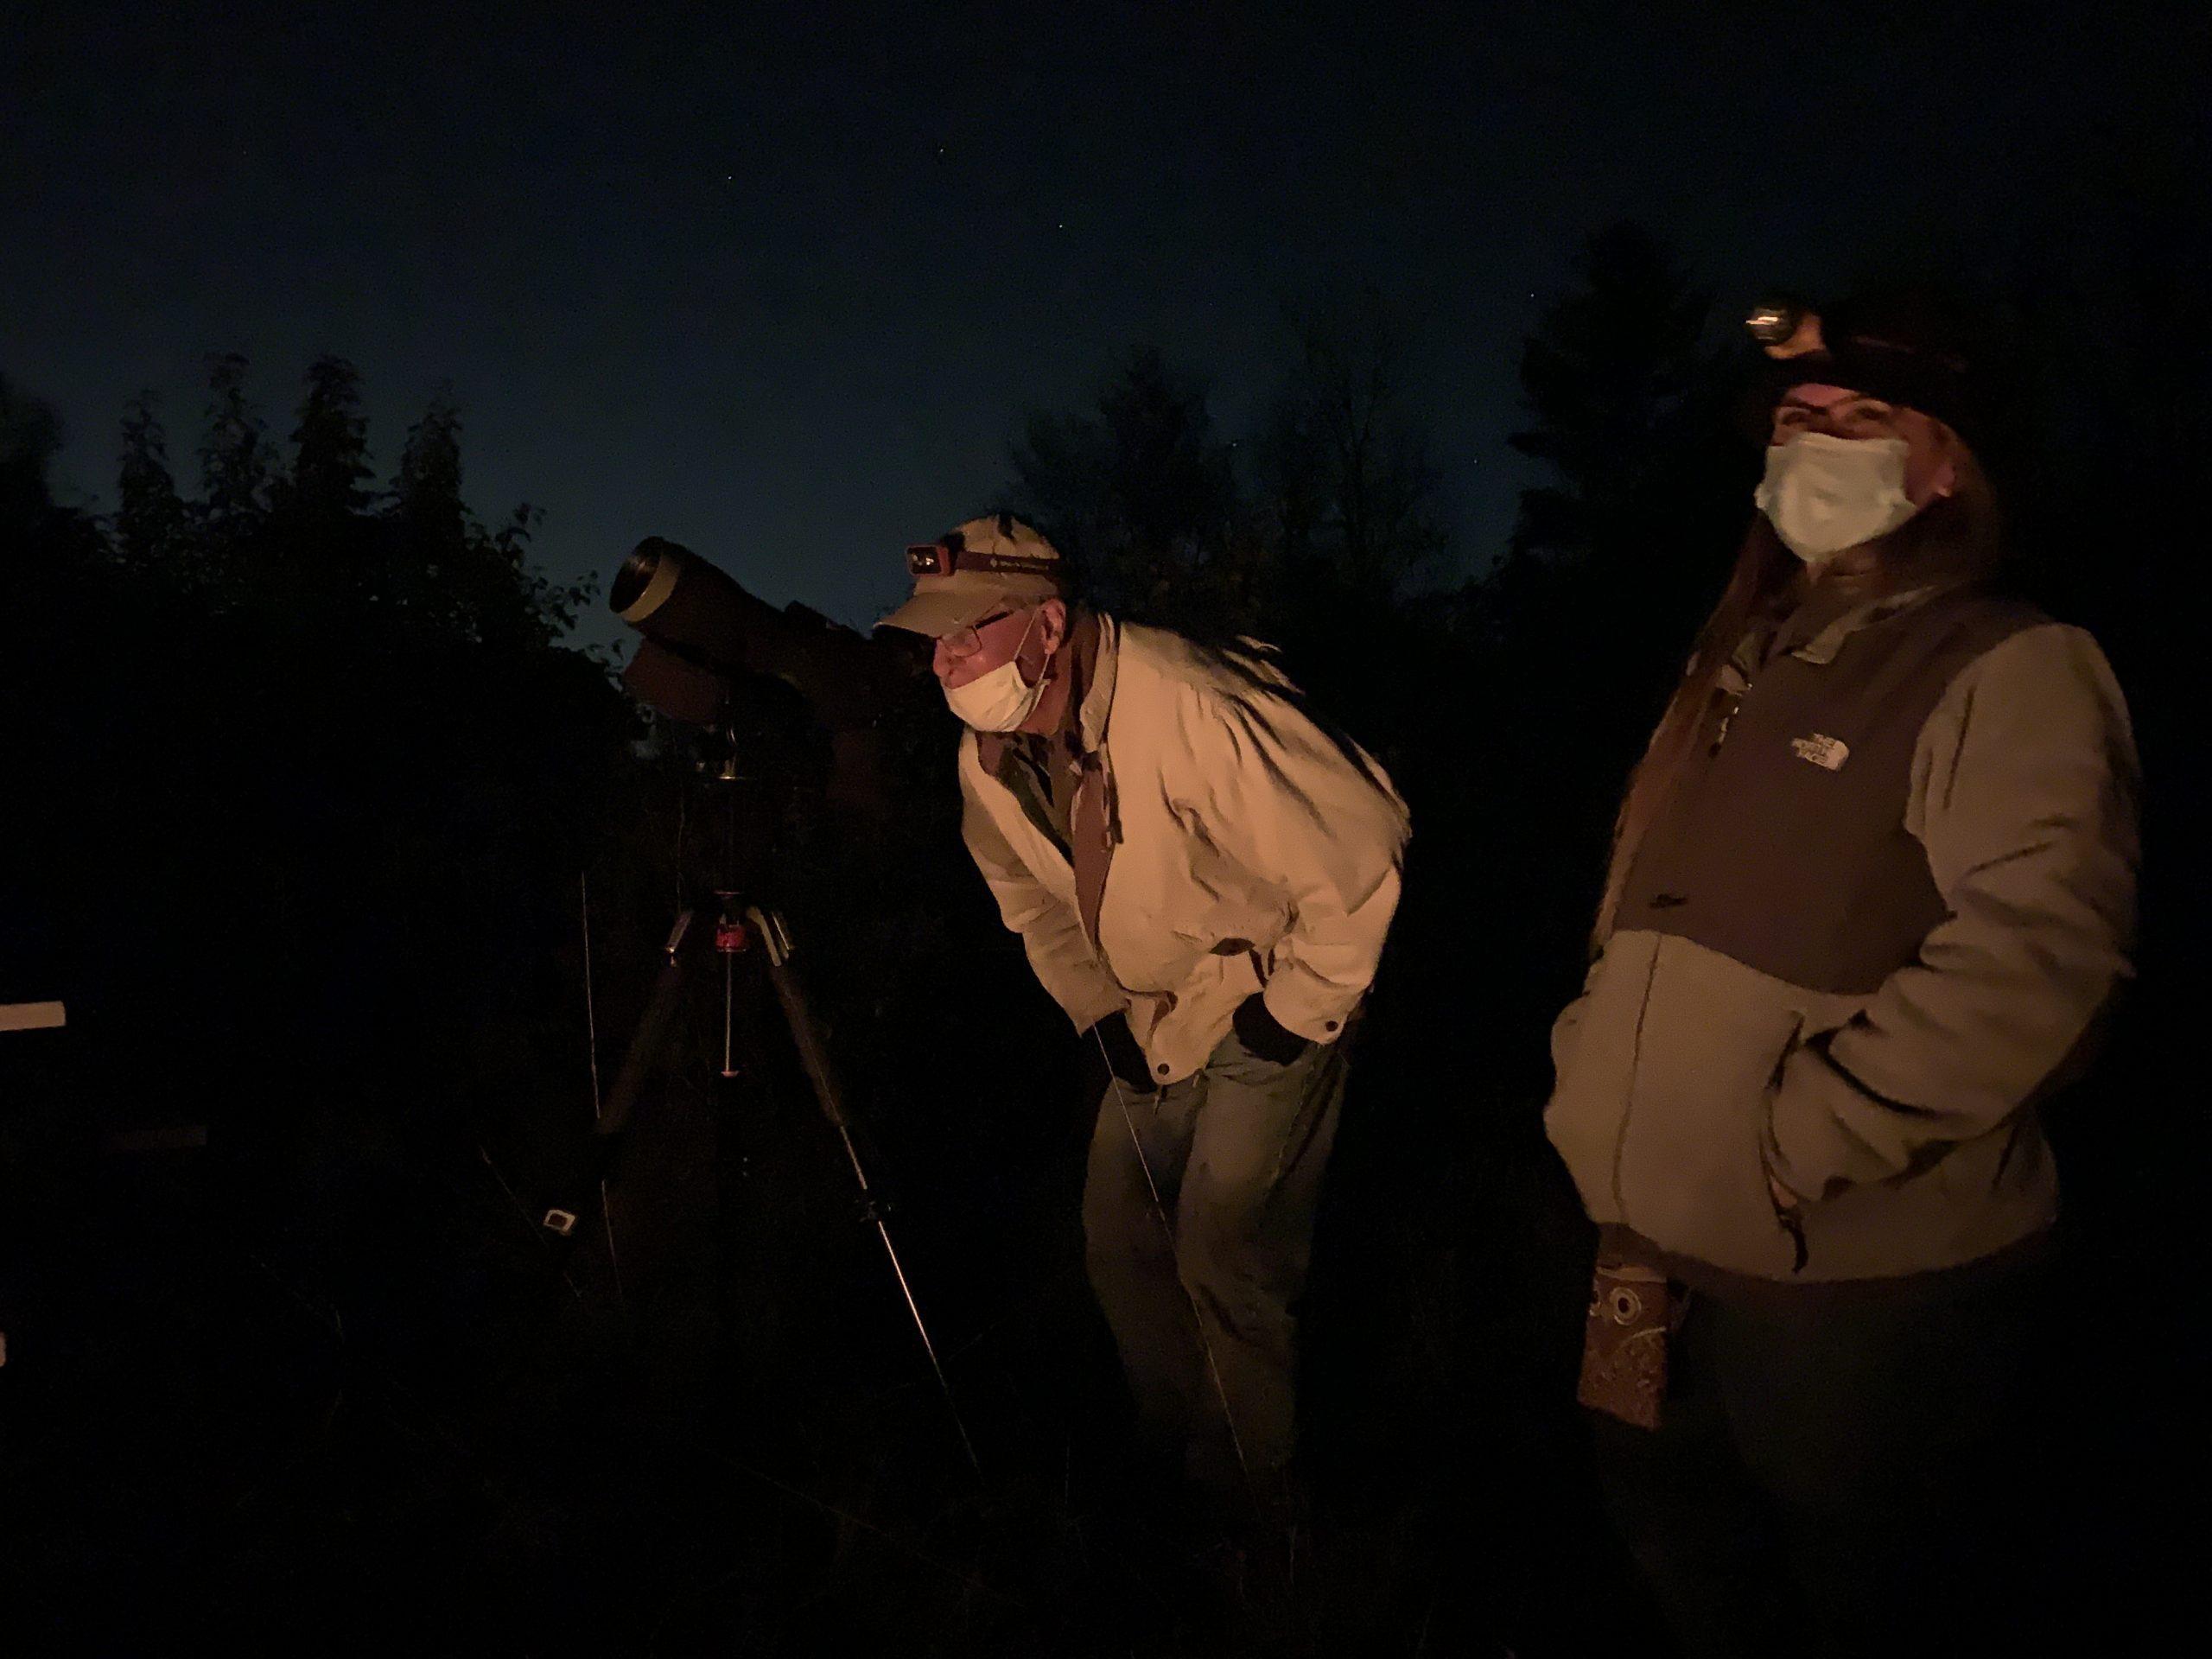 Stargazers look through a telescope at night